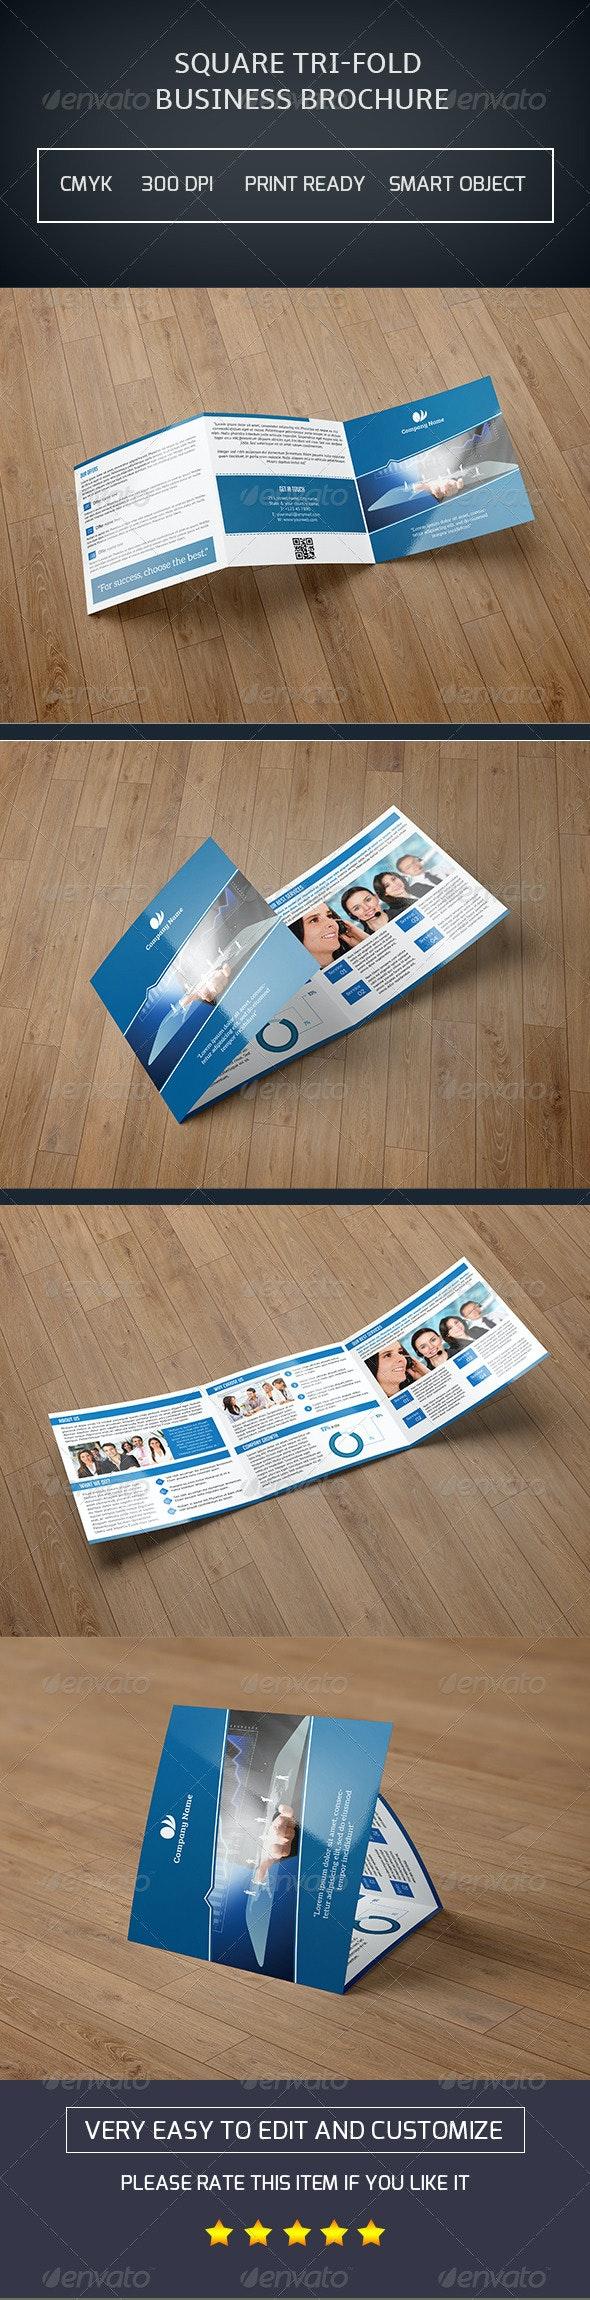 Square Trifold Brochure-V12 - Corporate Brochures